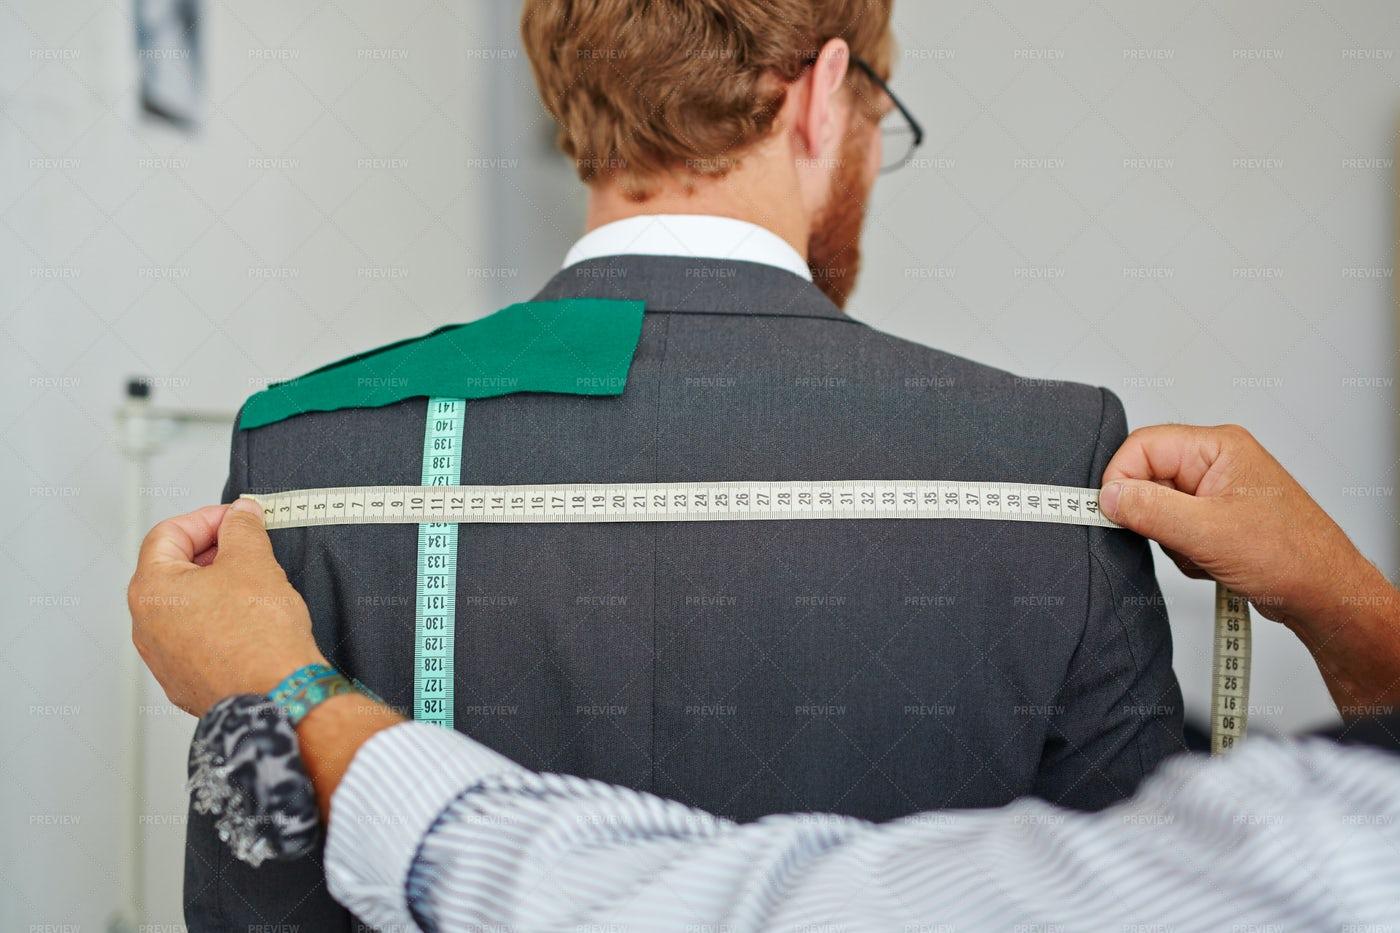 Tailor Taking Measurements On Customer: Stock Photos